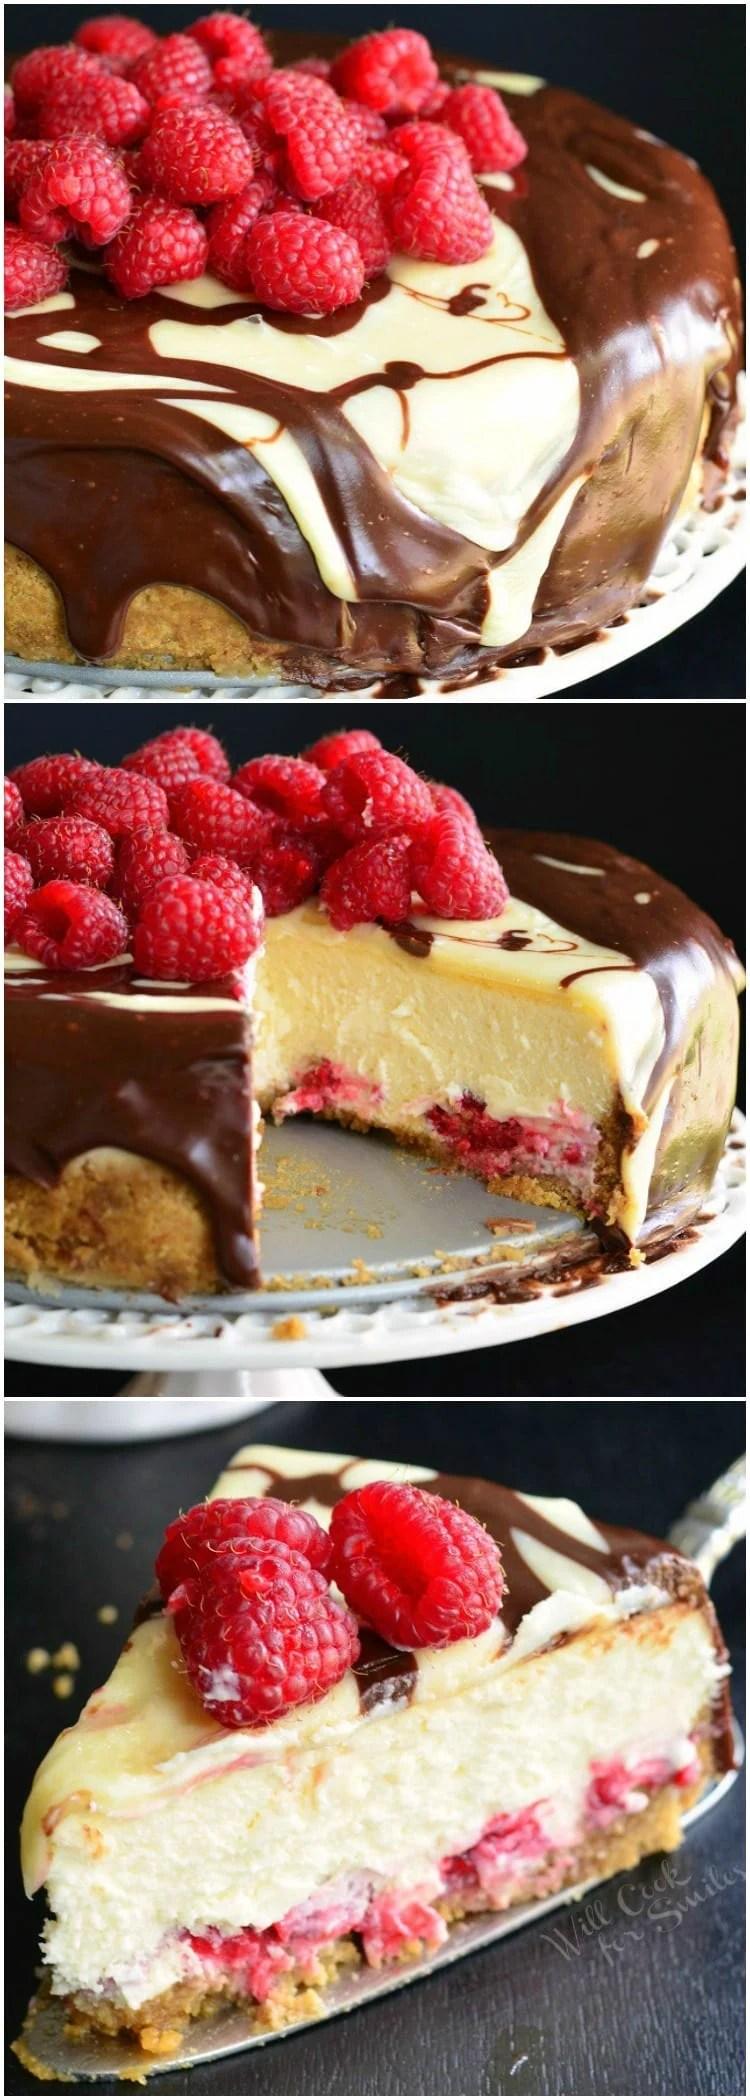 Double Chocolate Ganache And Raspberry Cheesecake Will